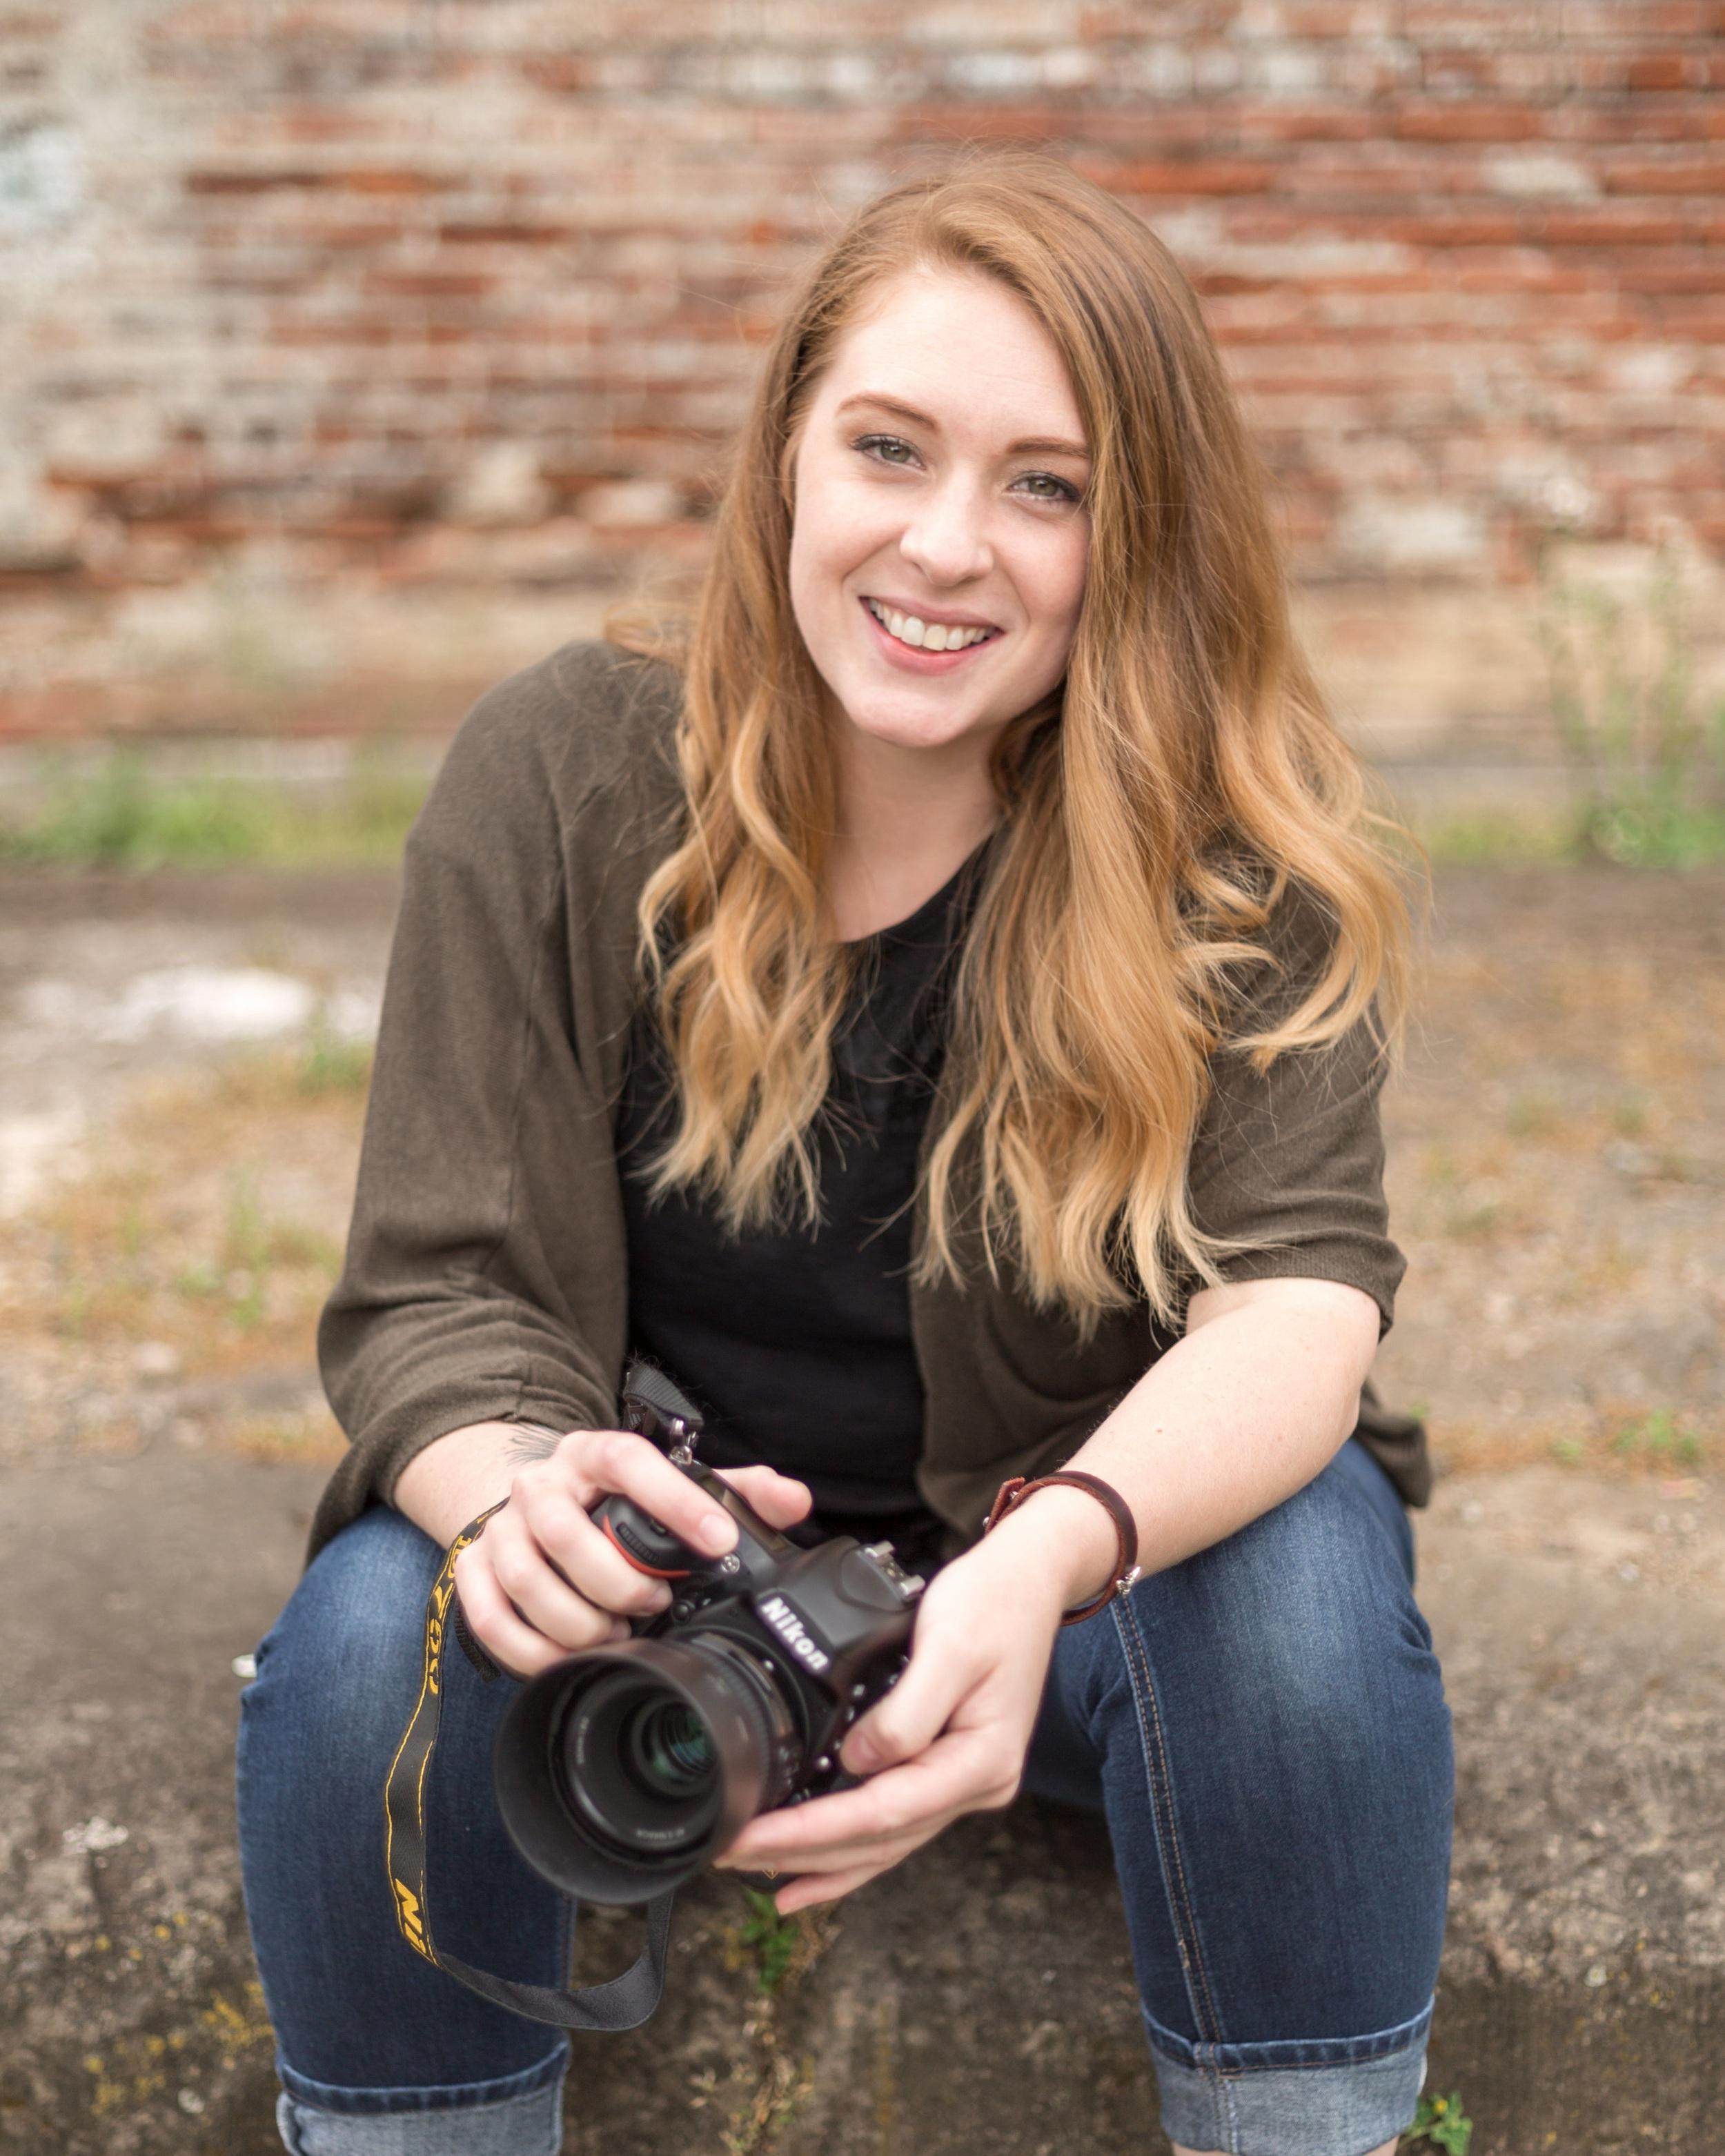 Photo by Sara Atkinson Photography